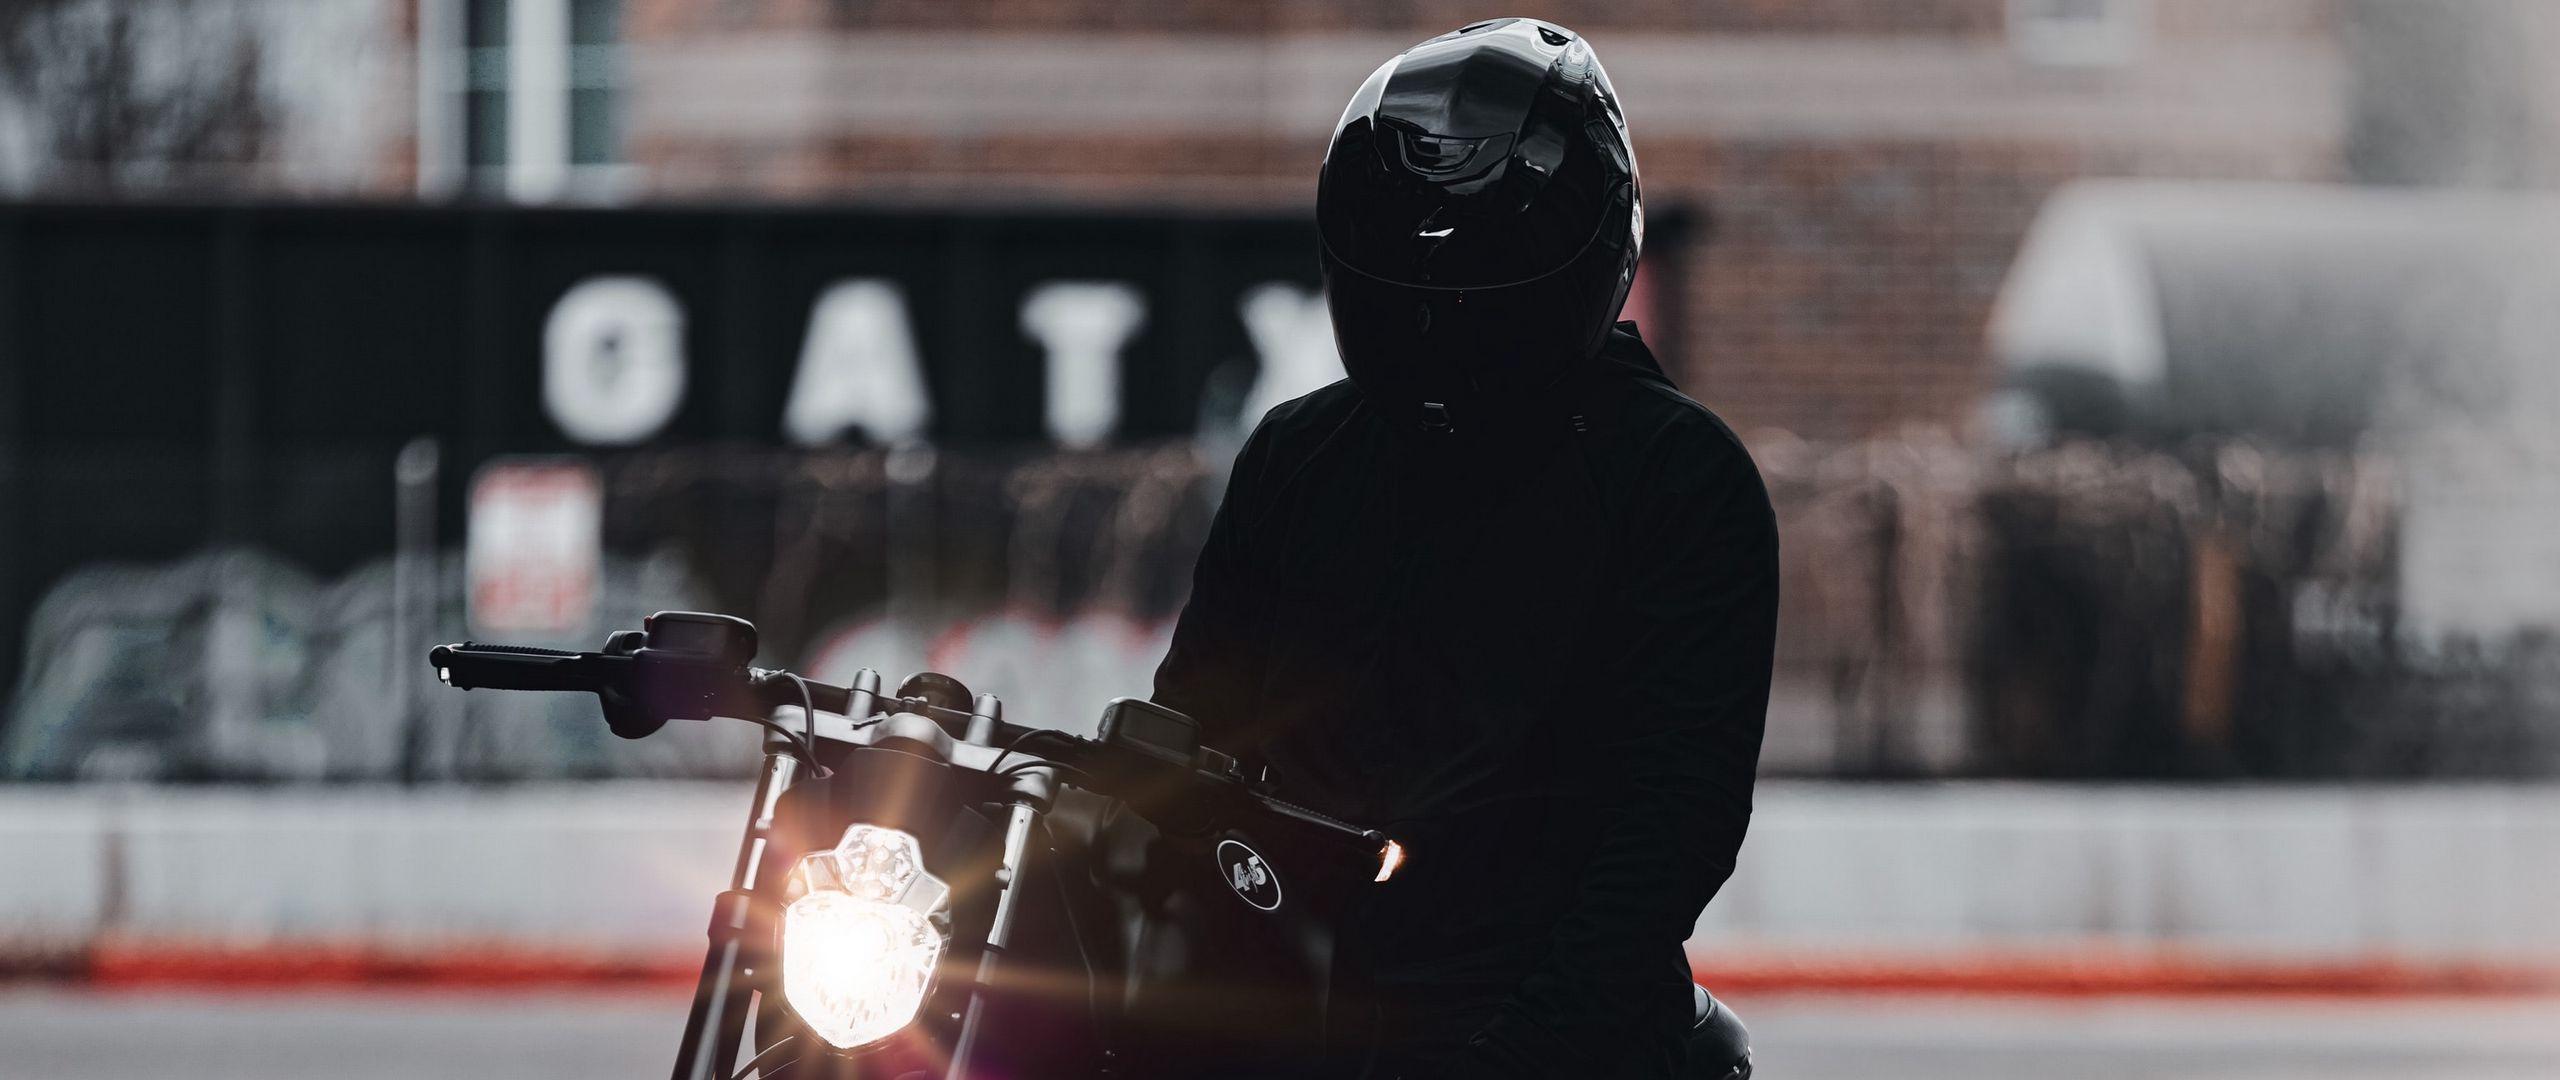 2560x1080 Обои мотоцикл, байк, мотоциклист, черный, свет, дорога